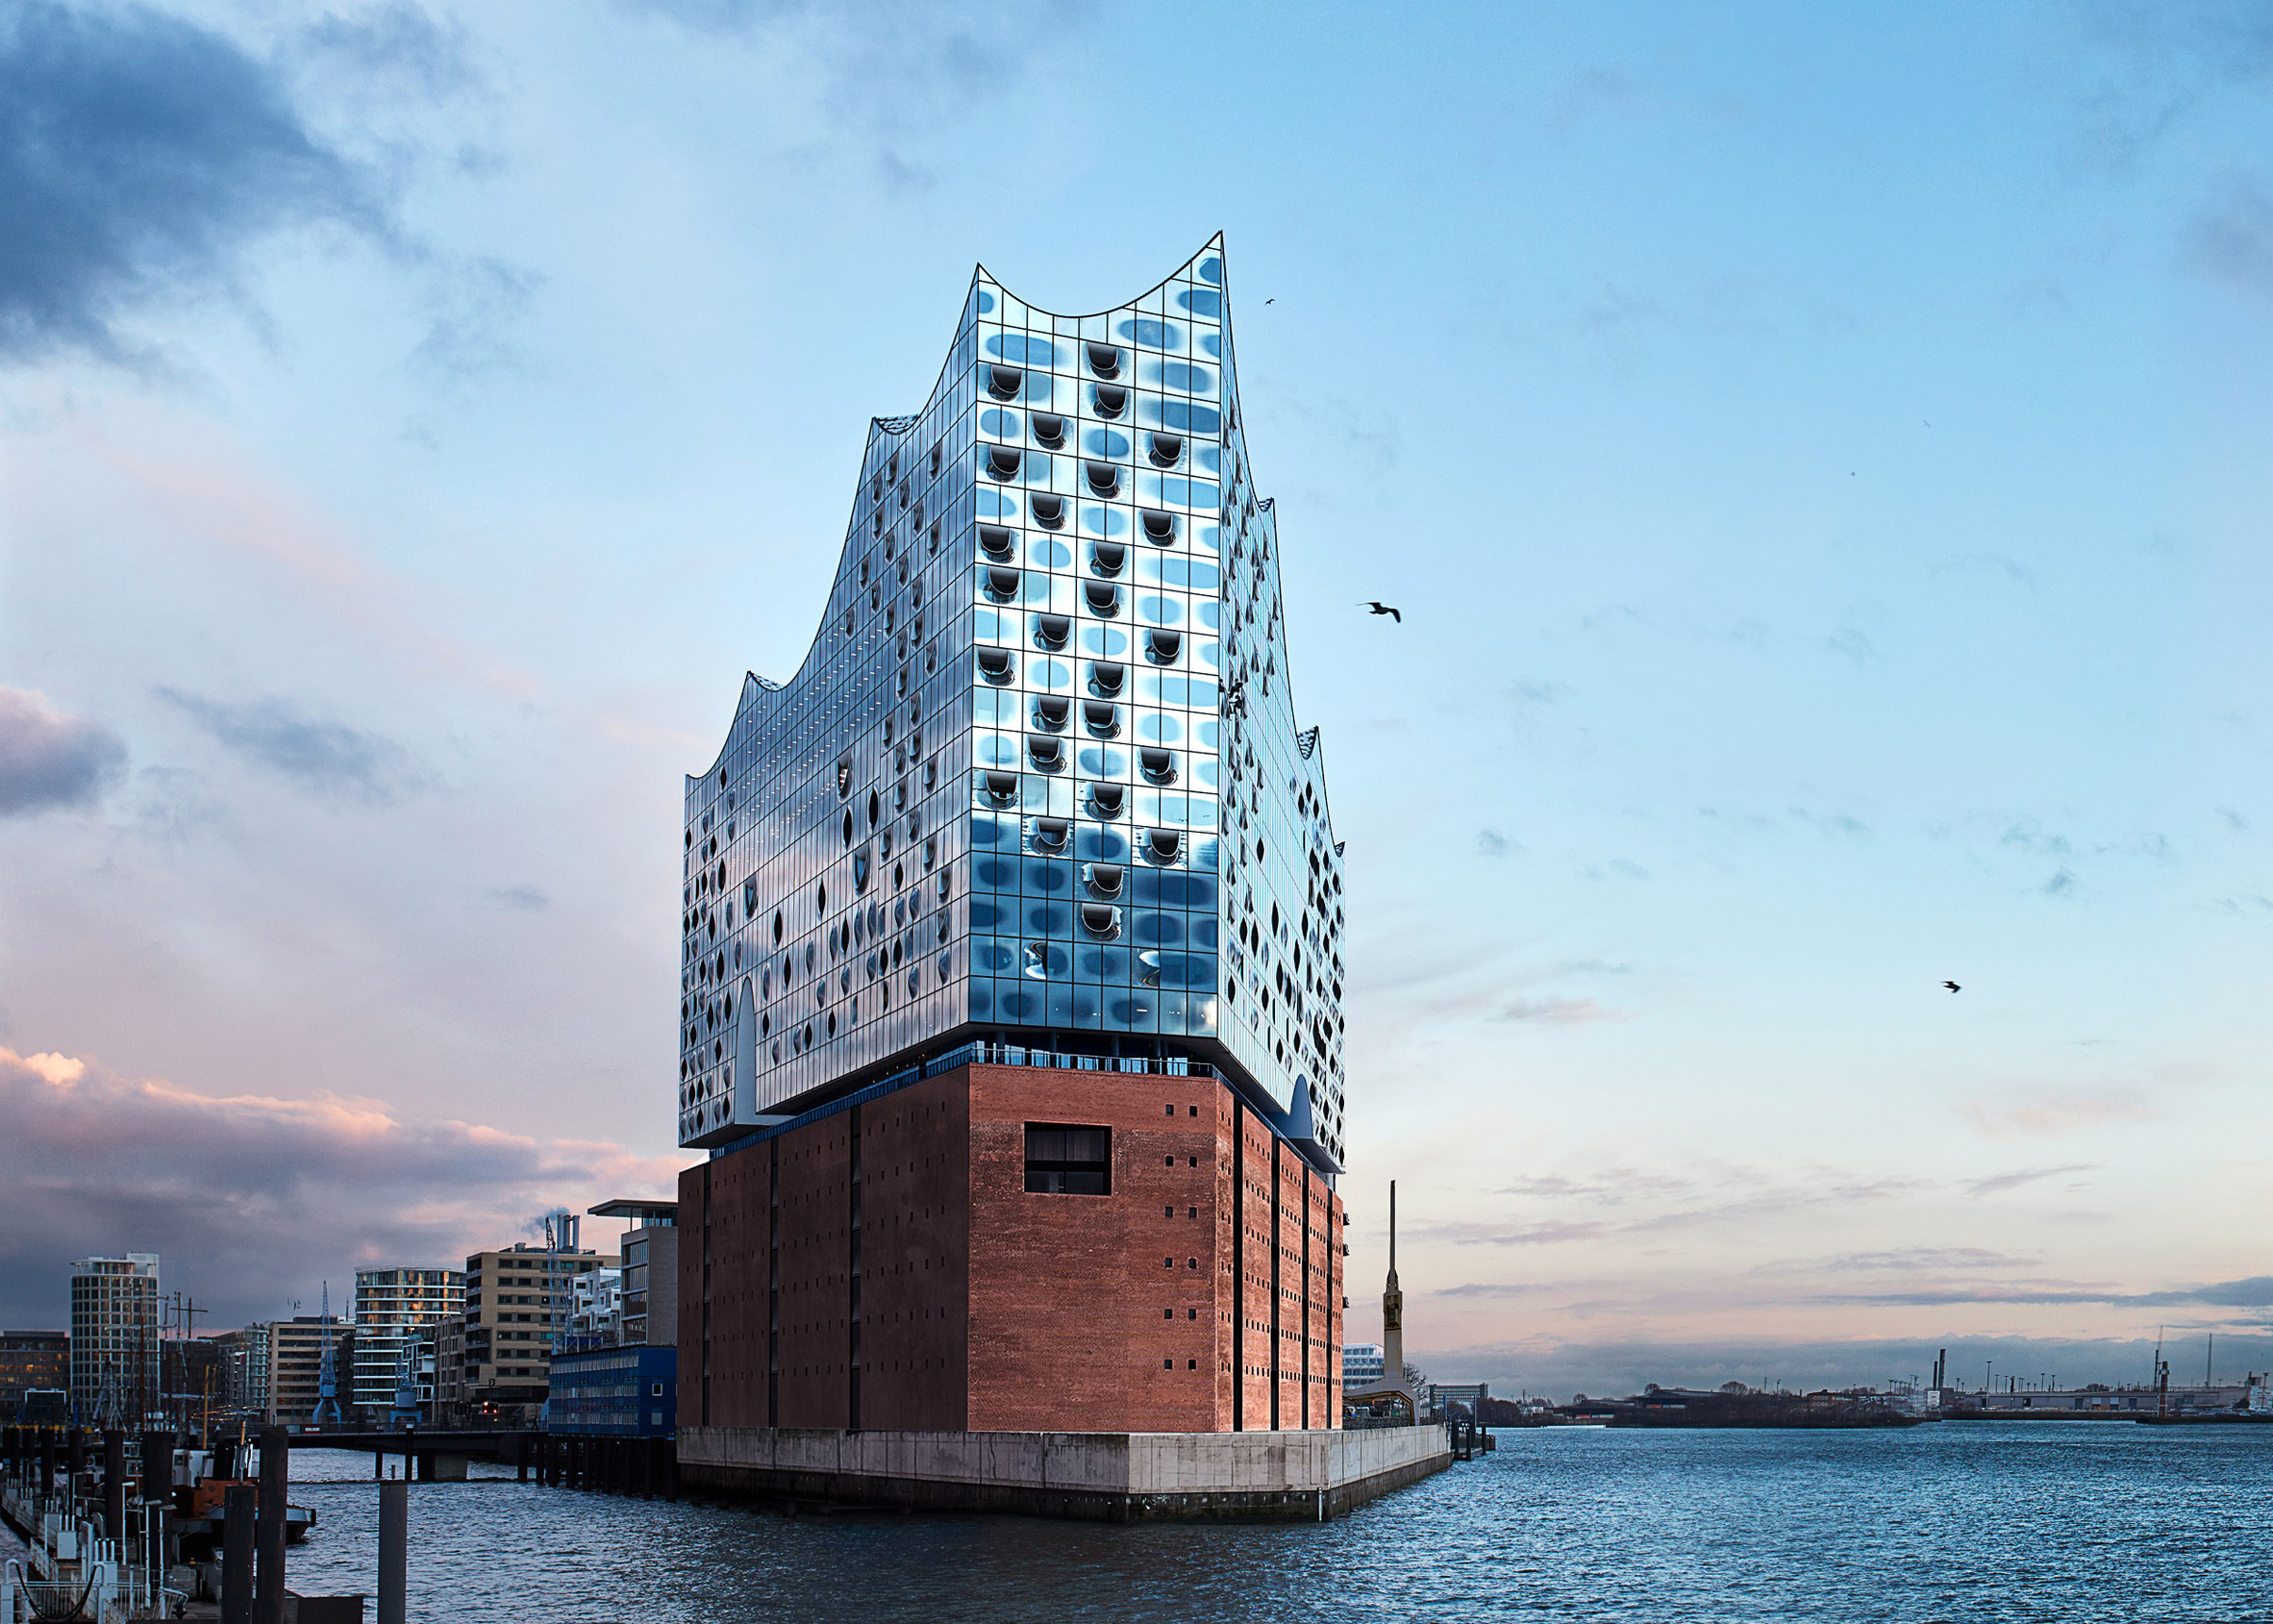 Drones offer fly-through preview of Herzog de Meuron's Elbphilharmonie Hamburg